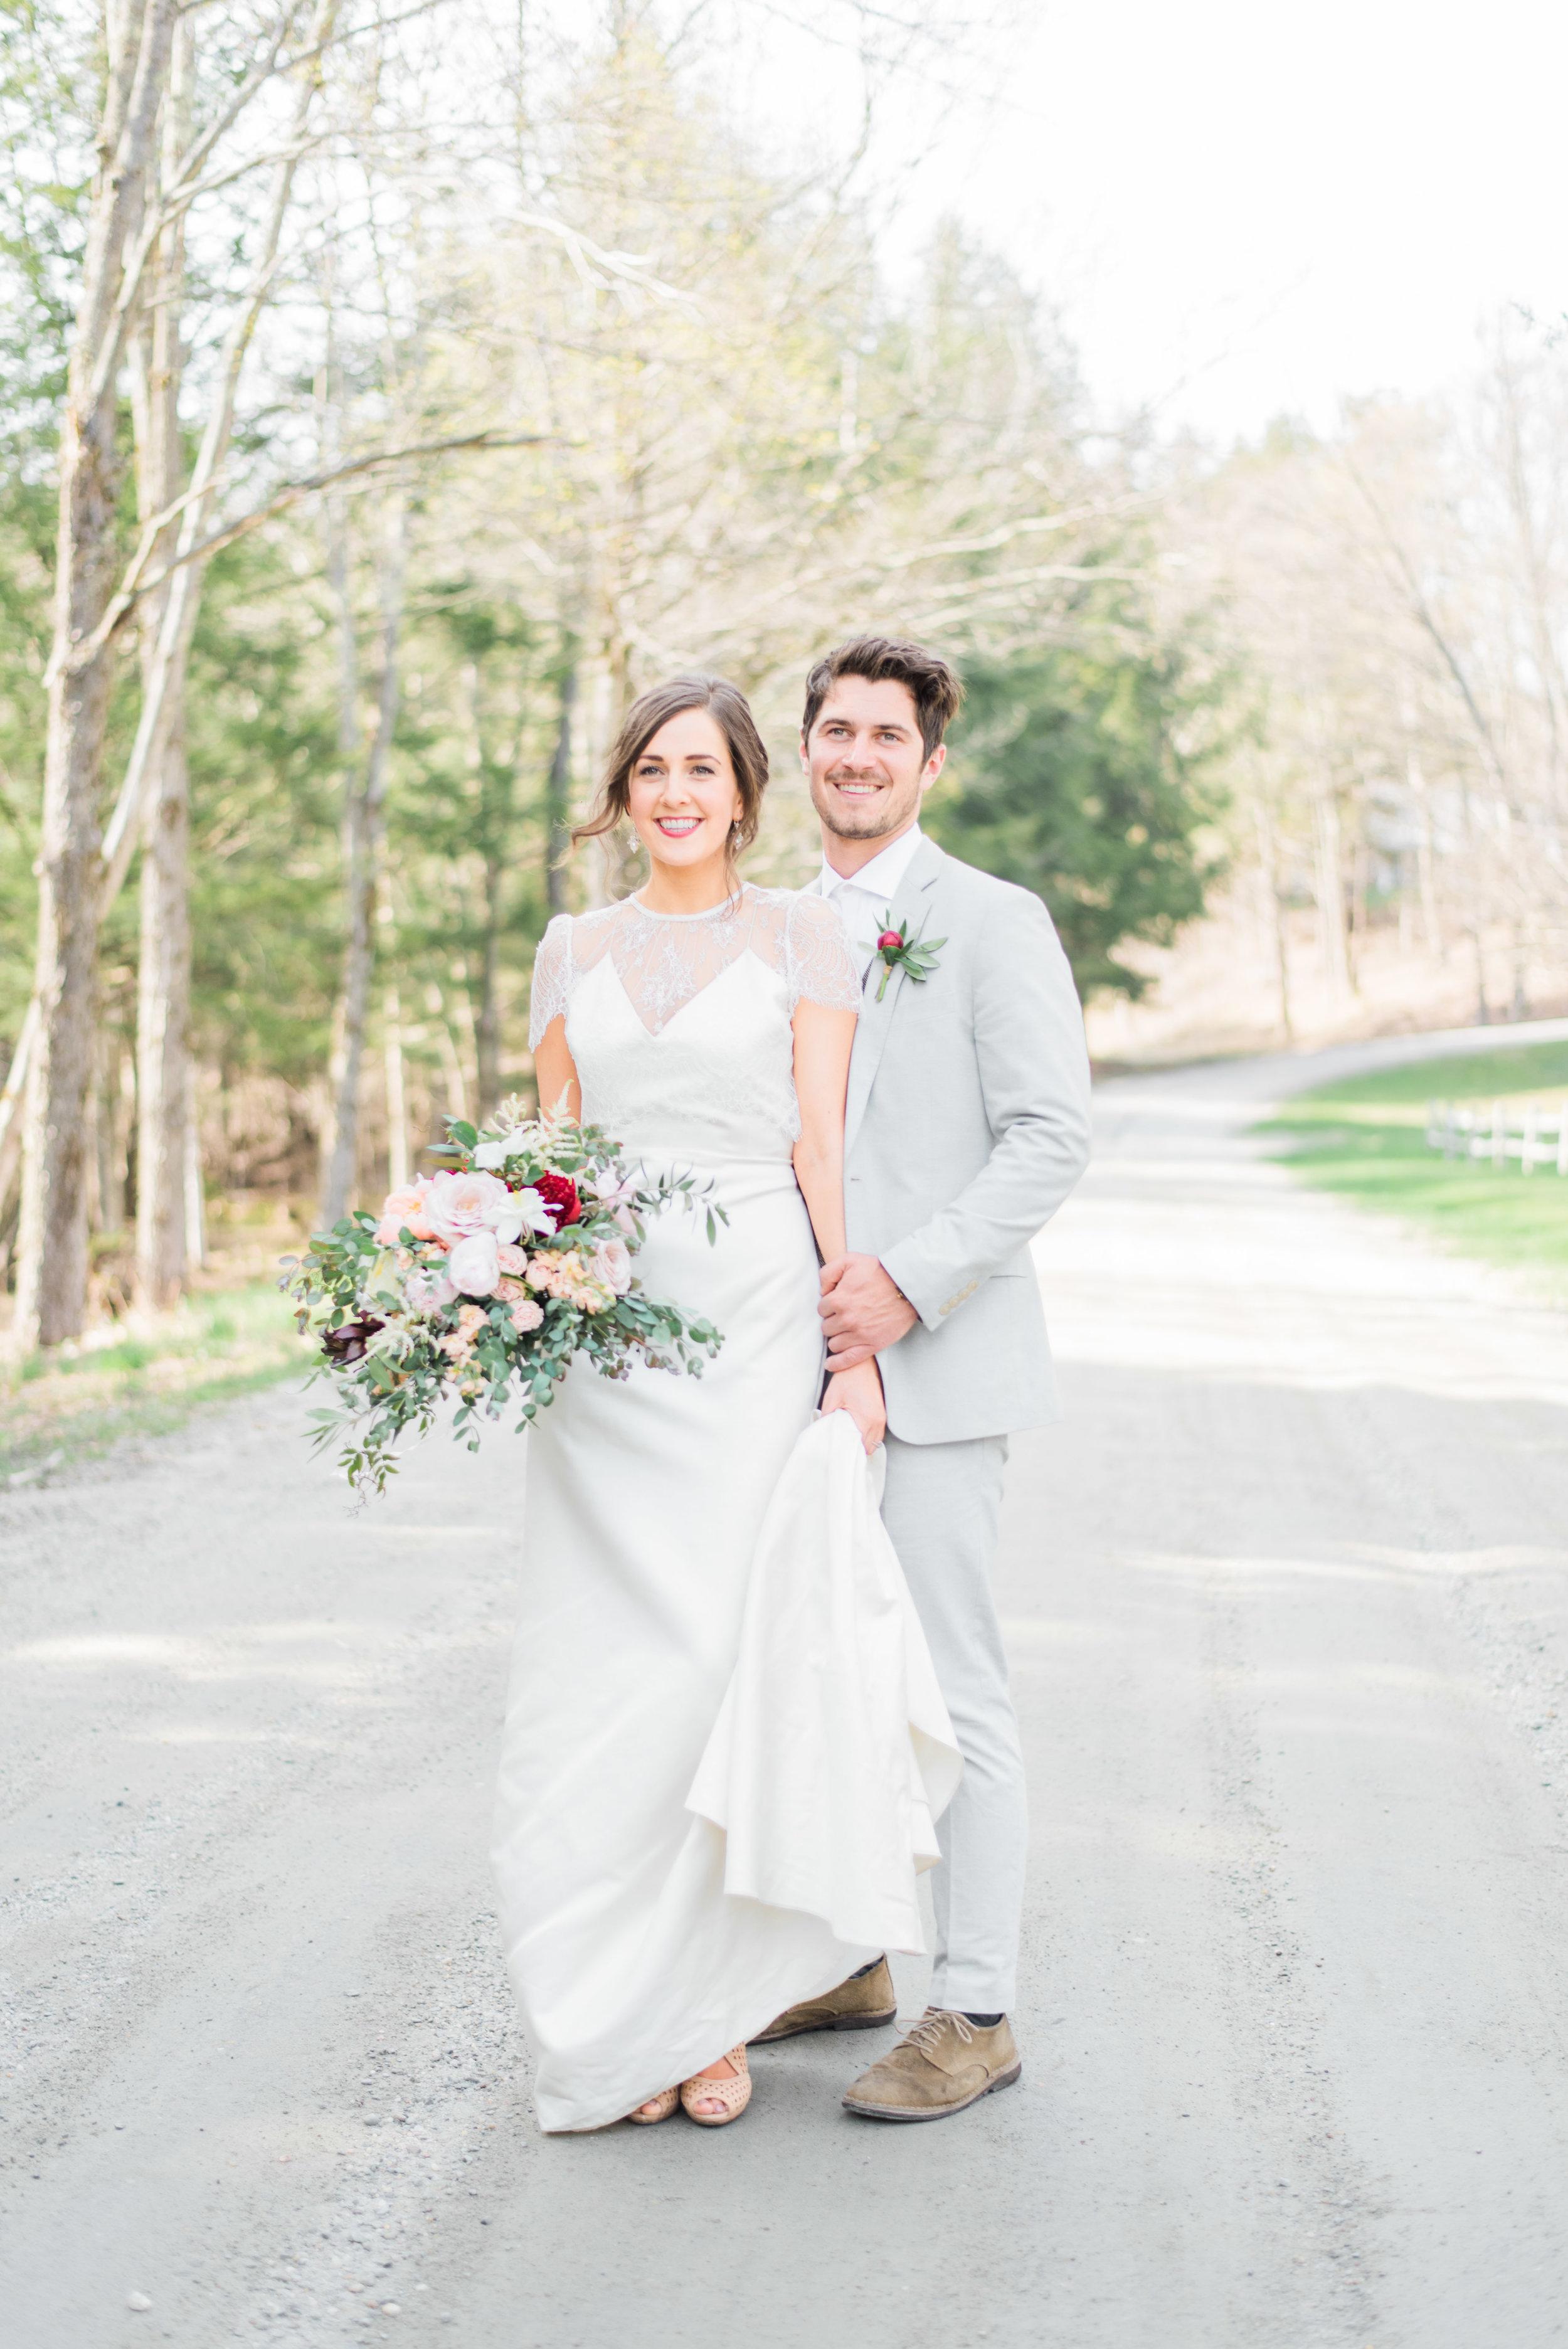 gray-door-photography-wedding-photographer-steph-erffmeyer-dallas-destination5.jpg